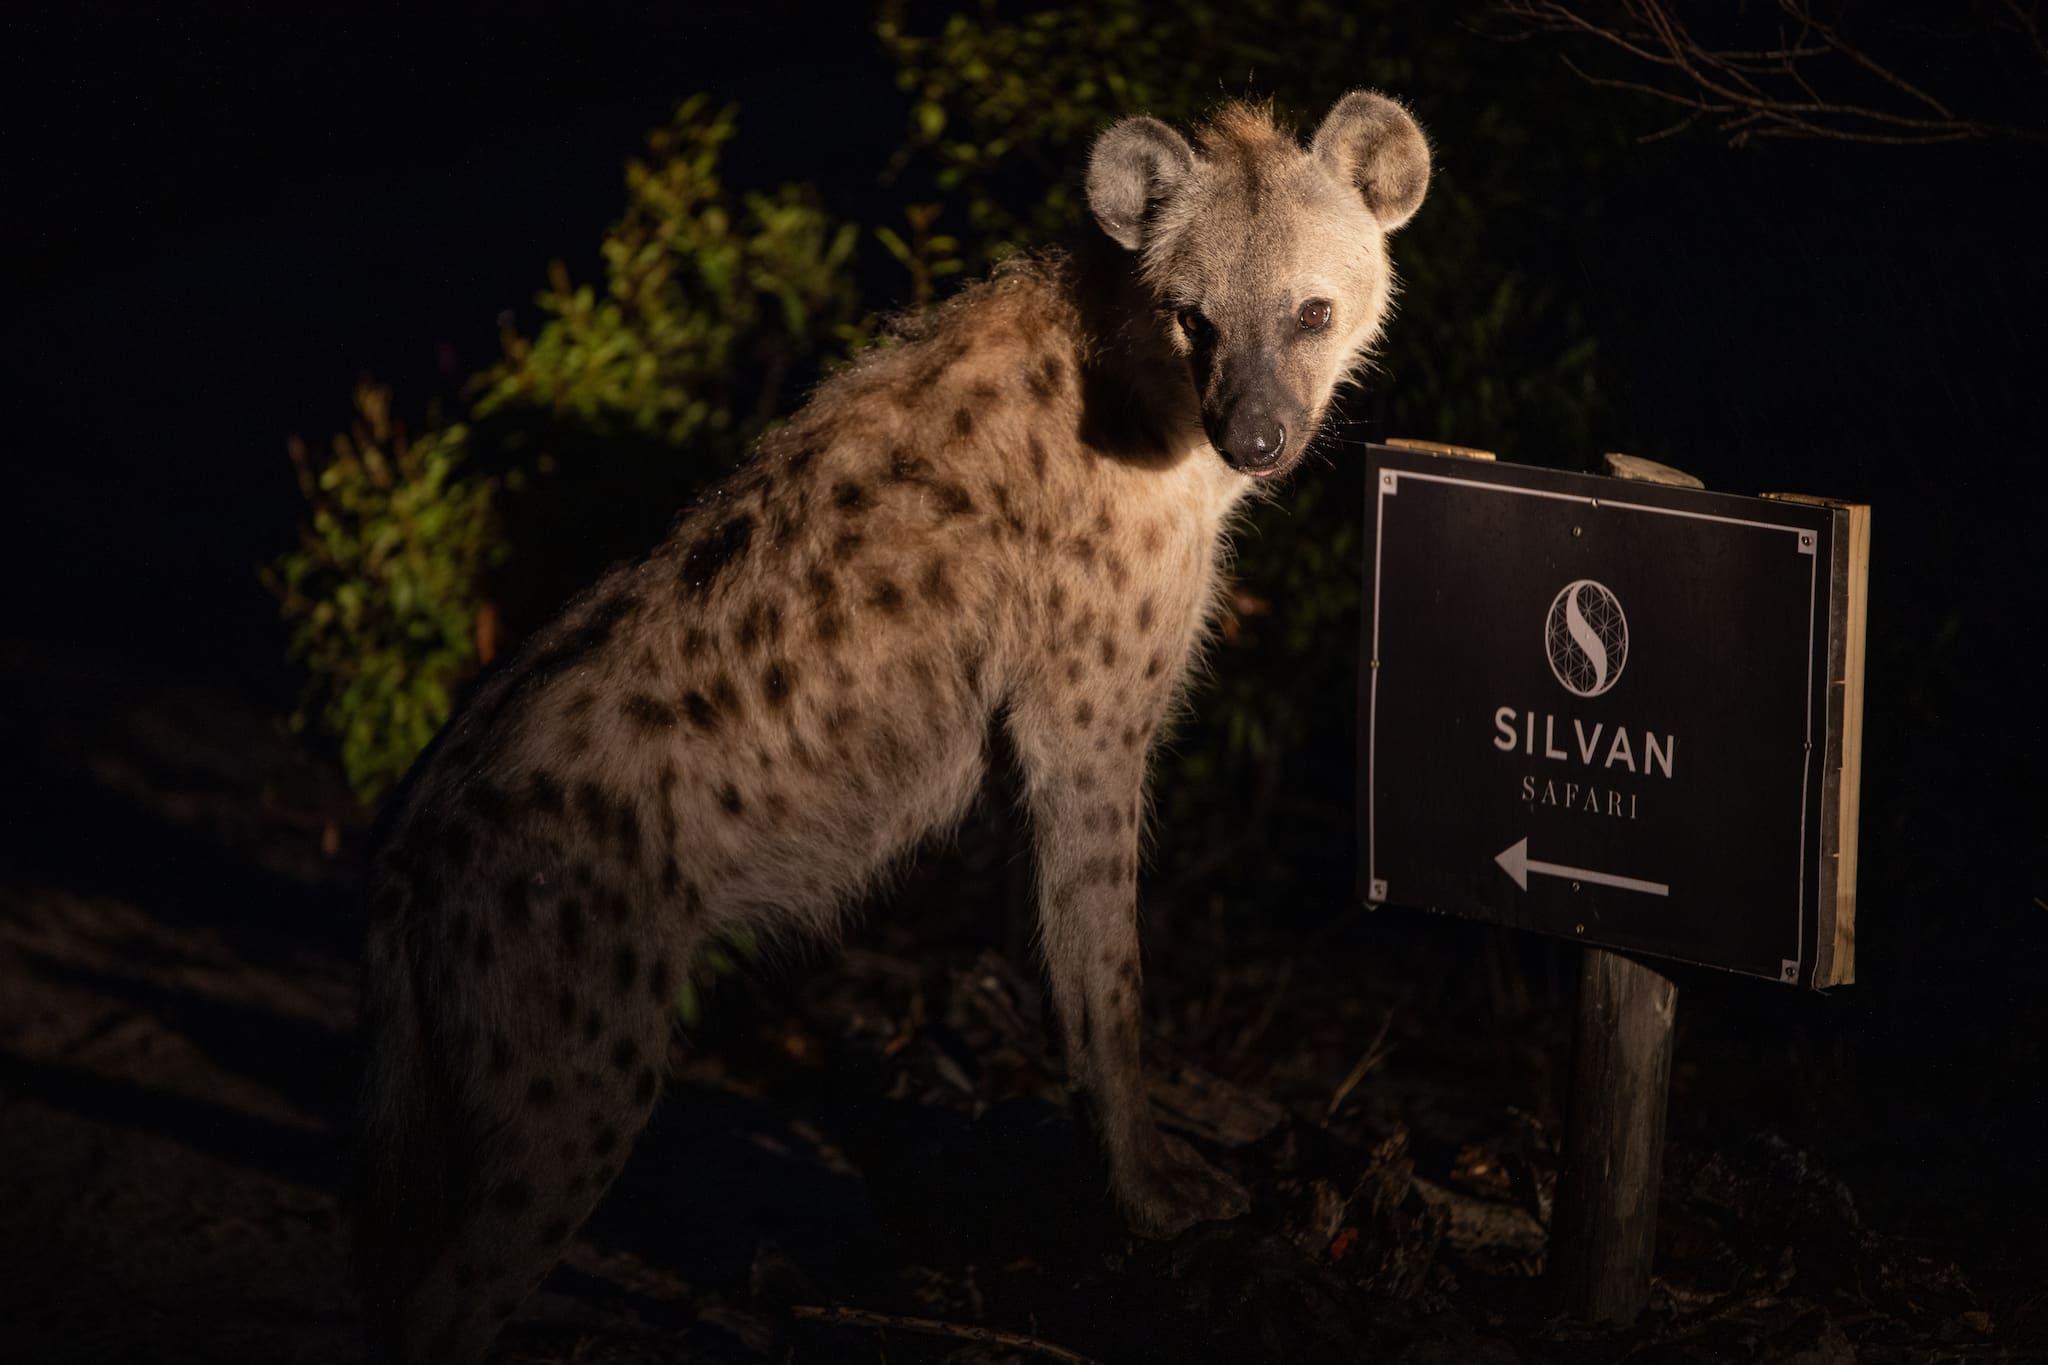 Hyena at night at Silvan Safari